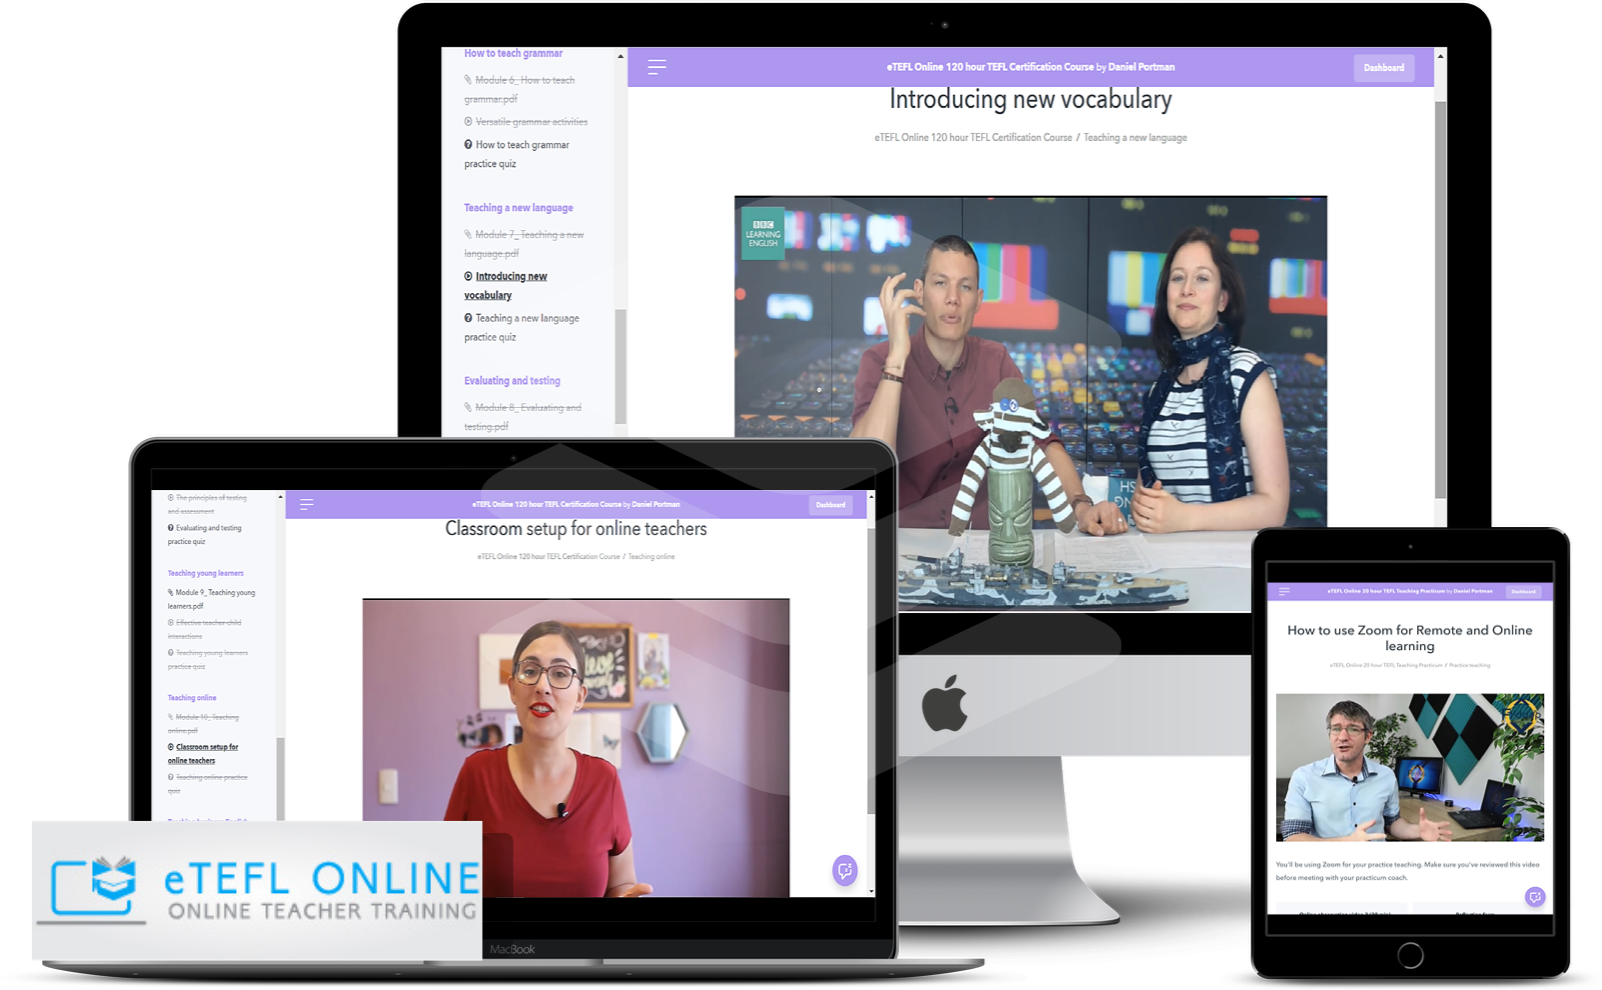 Standalone 120-hour Online TEFL/TESOL Course - eTEFL Online